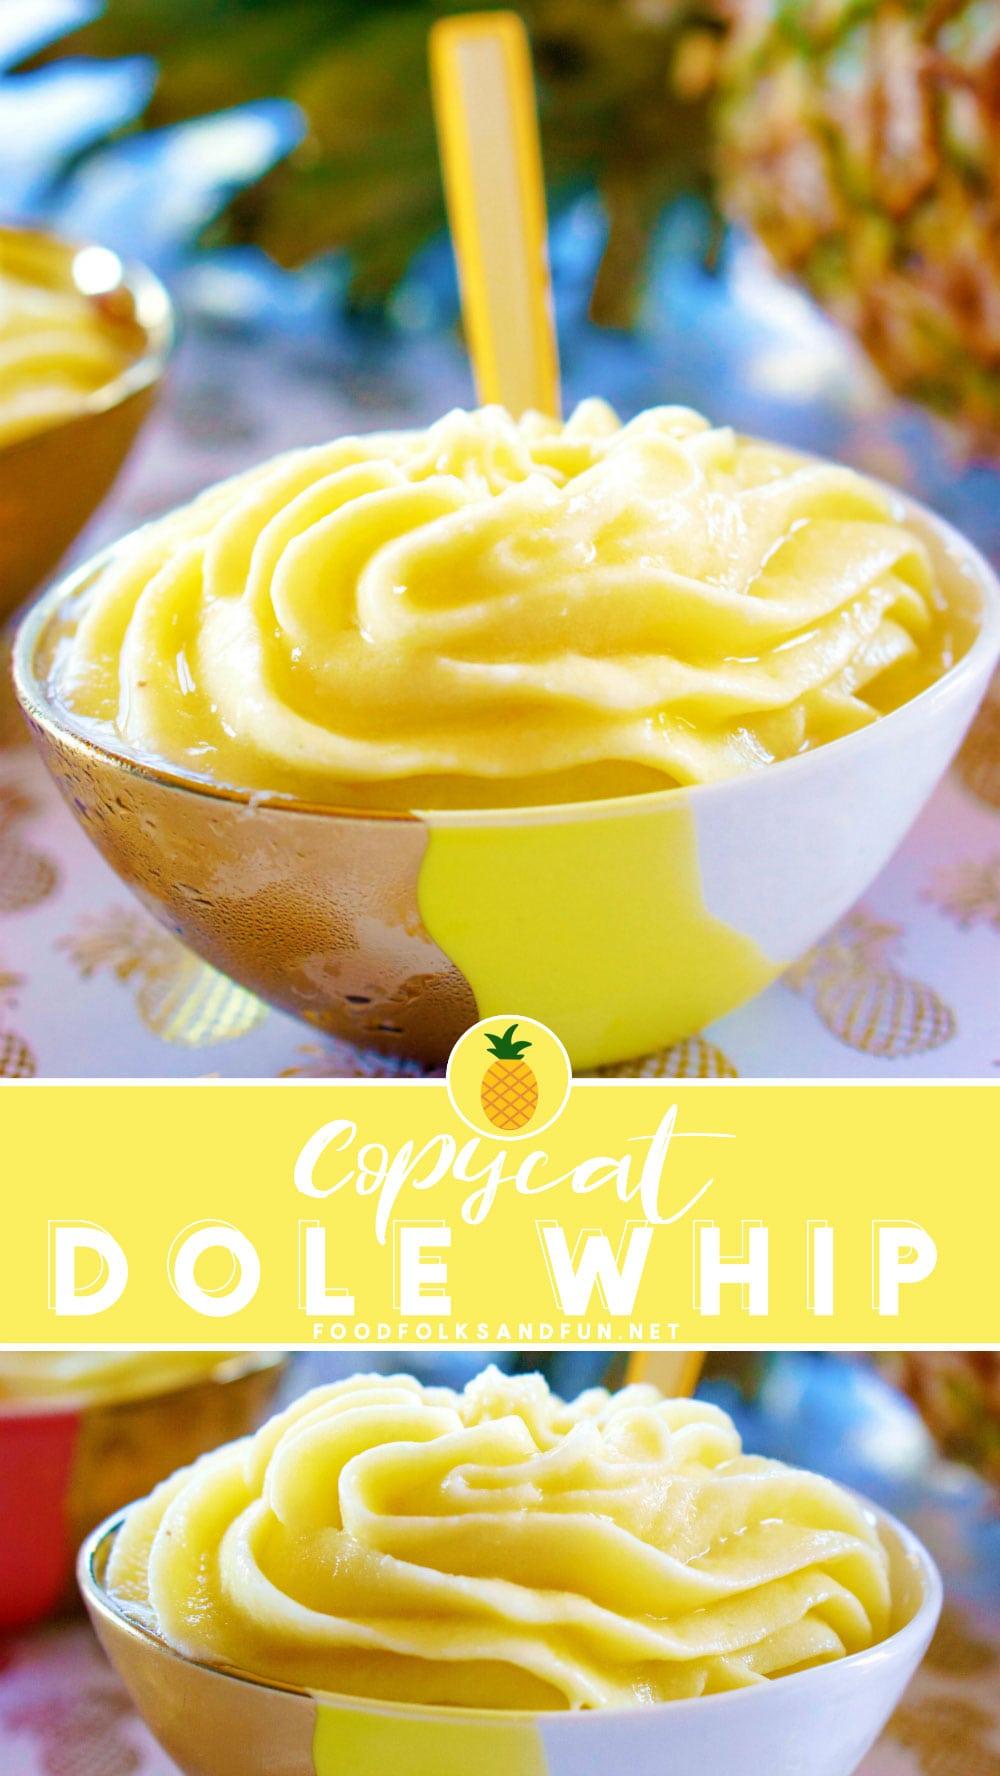 The best copycat Dole Whip recipe!